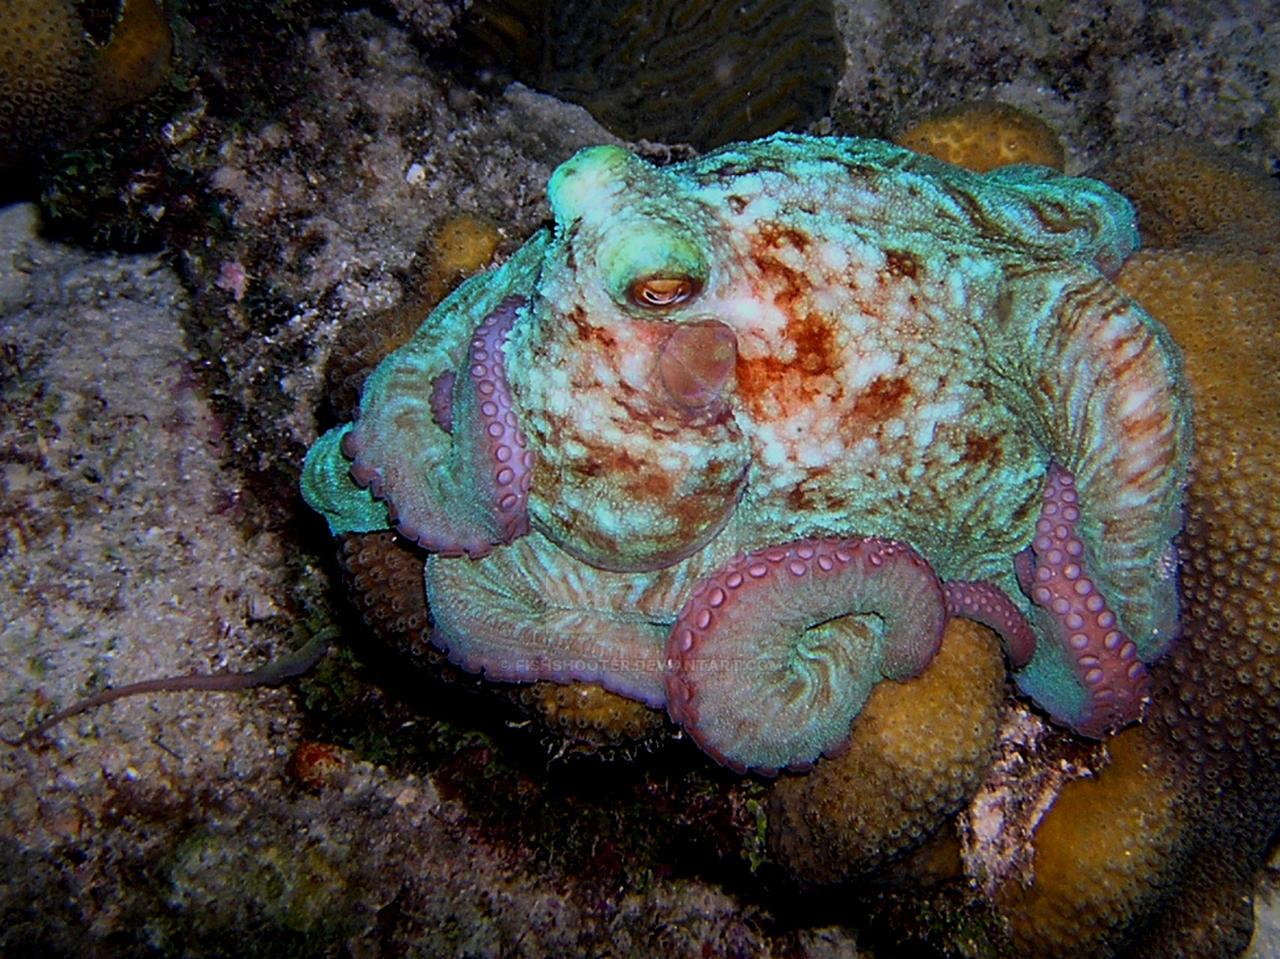 Caribbean Reef Octopus 1 by FishShooter on DeviantArt